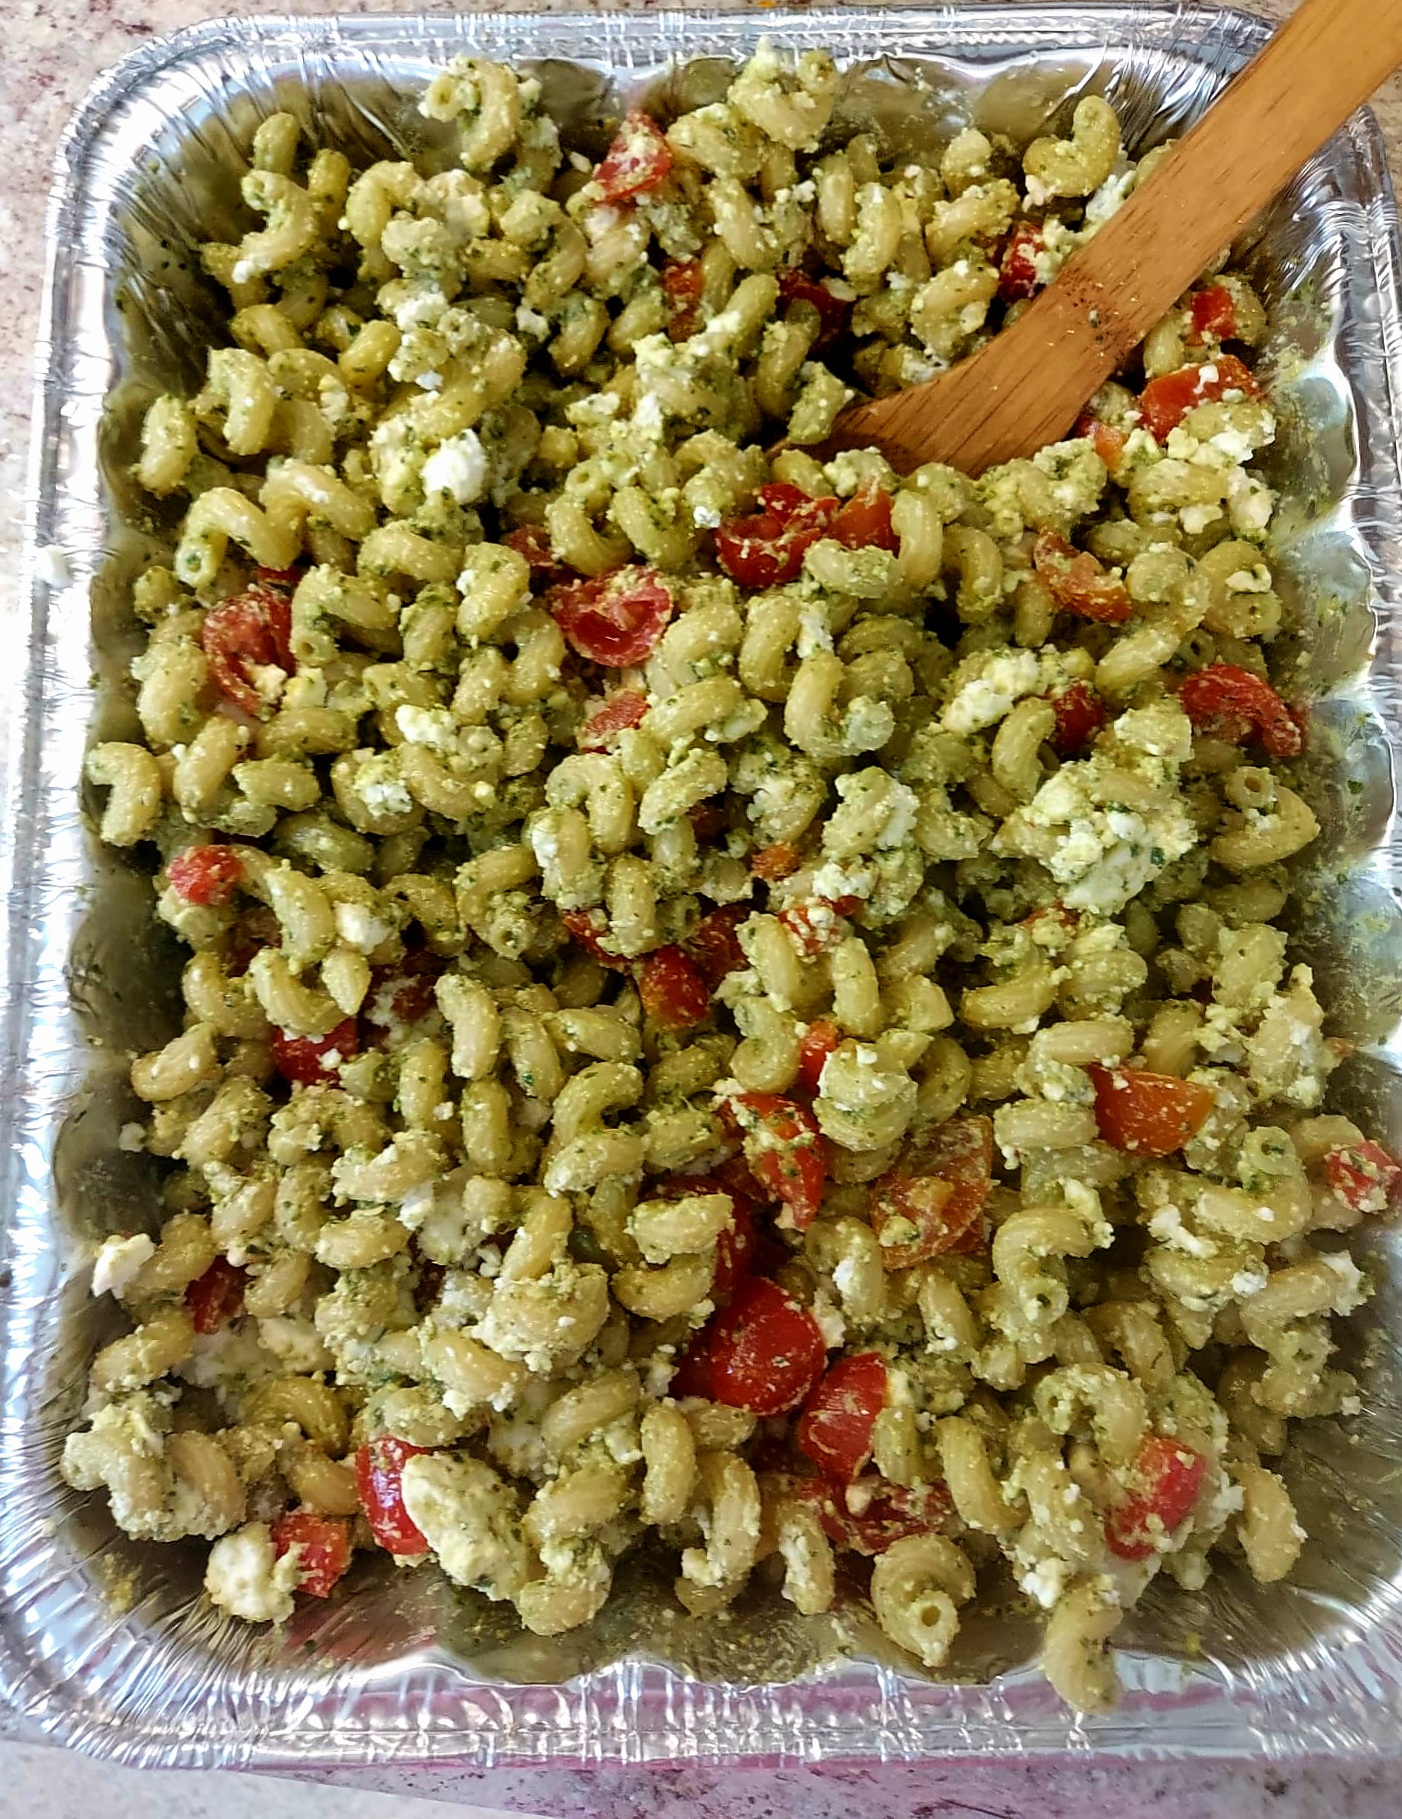 Italian flag pasta salad